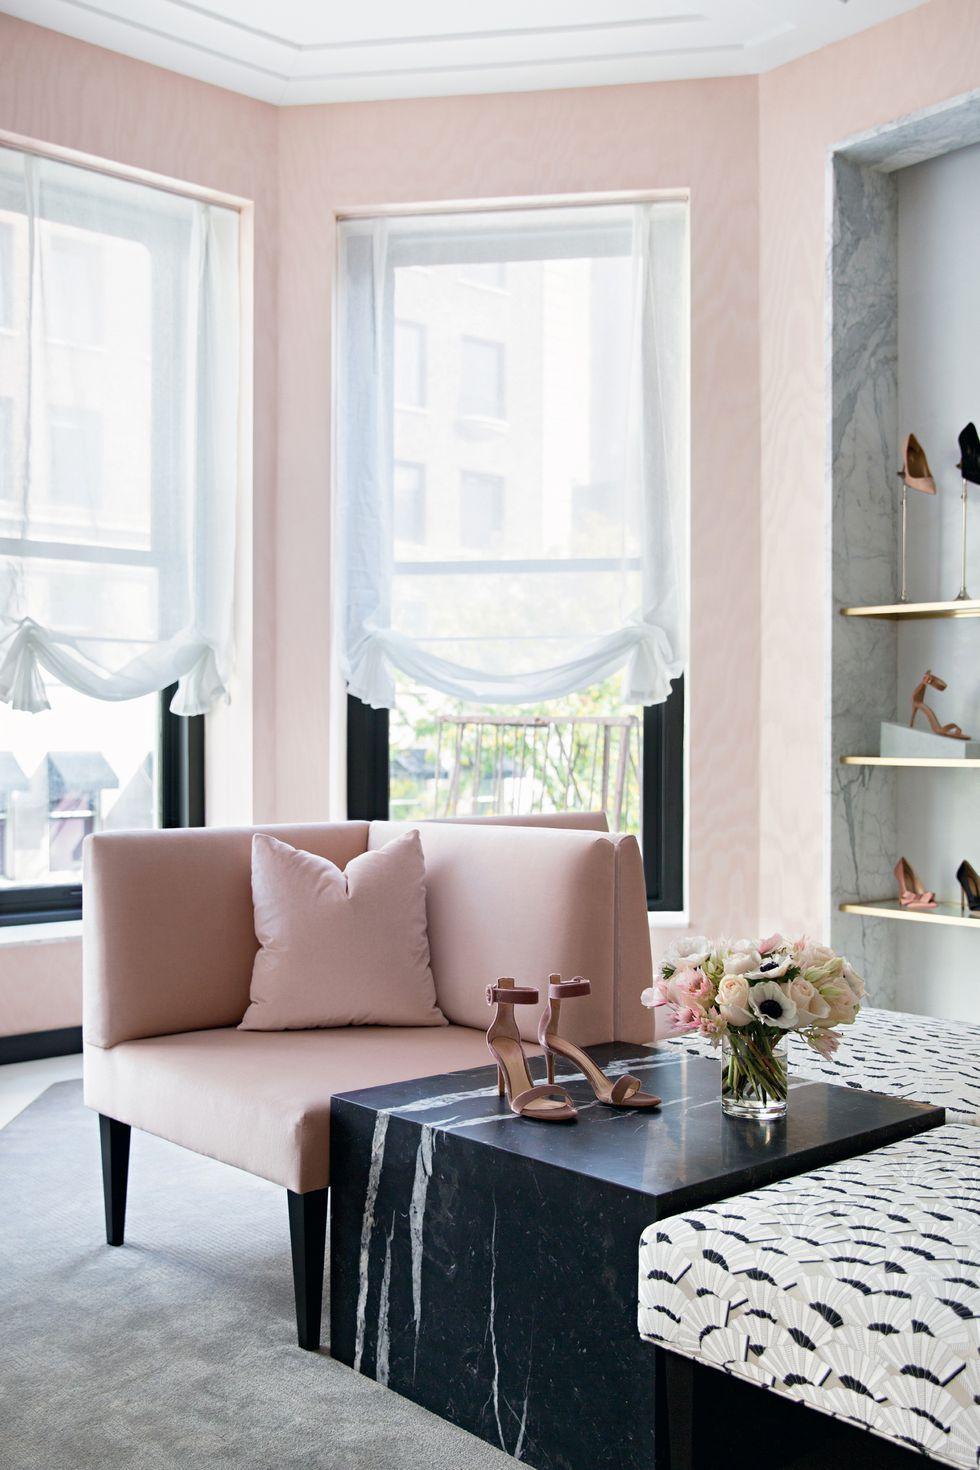 Ryan Korban: Interiors, Rizzoli New York, 2018.